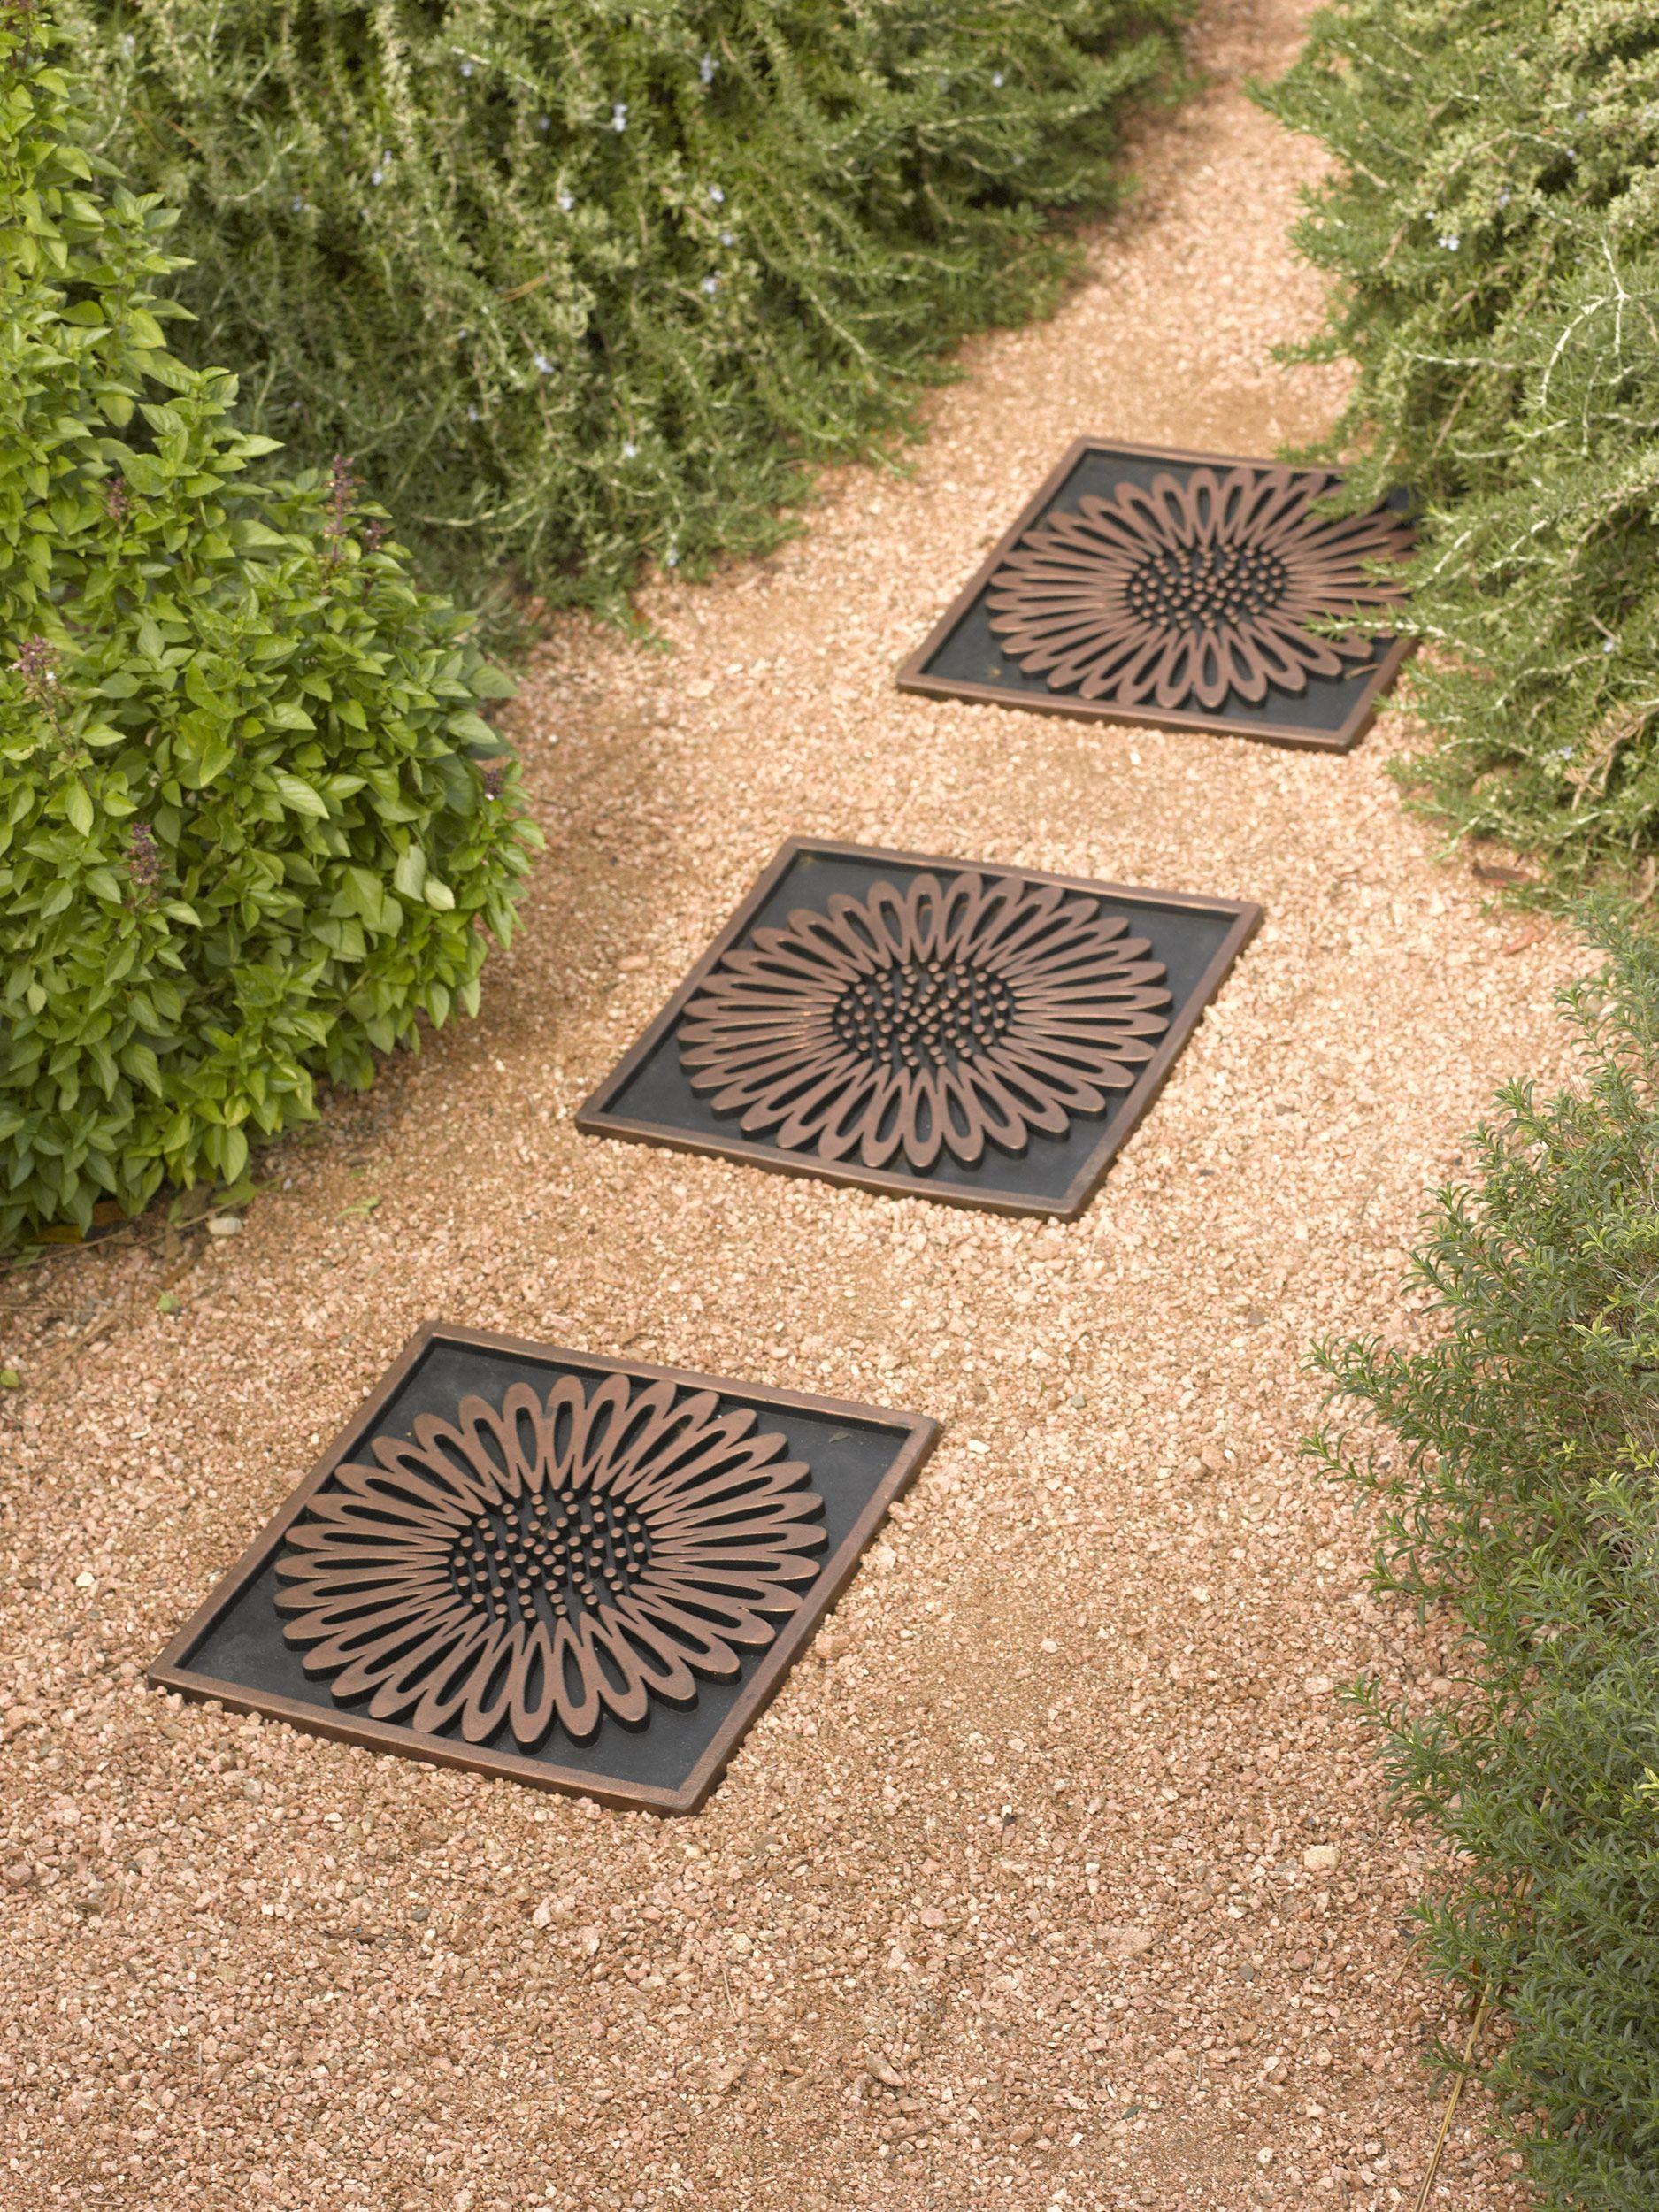 stone garden border path mats set of 4-collections etc